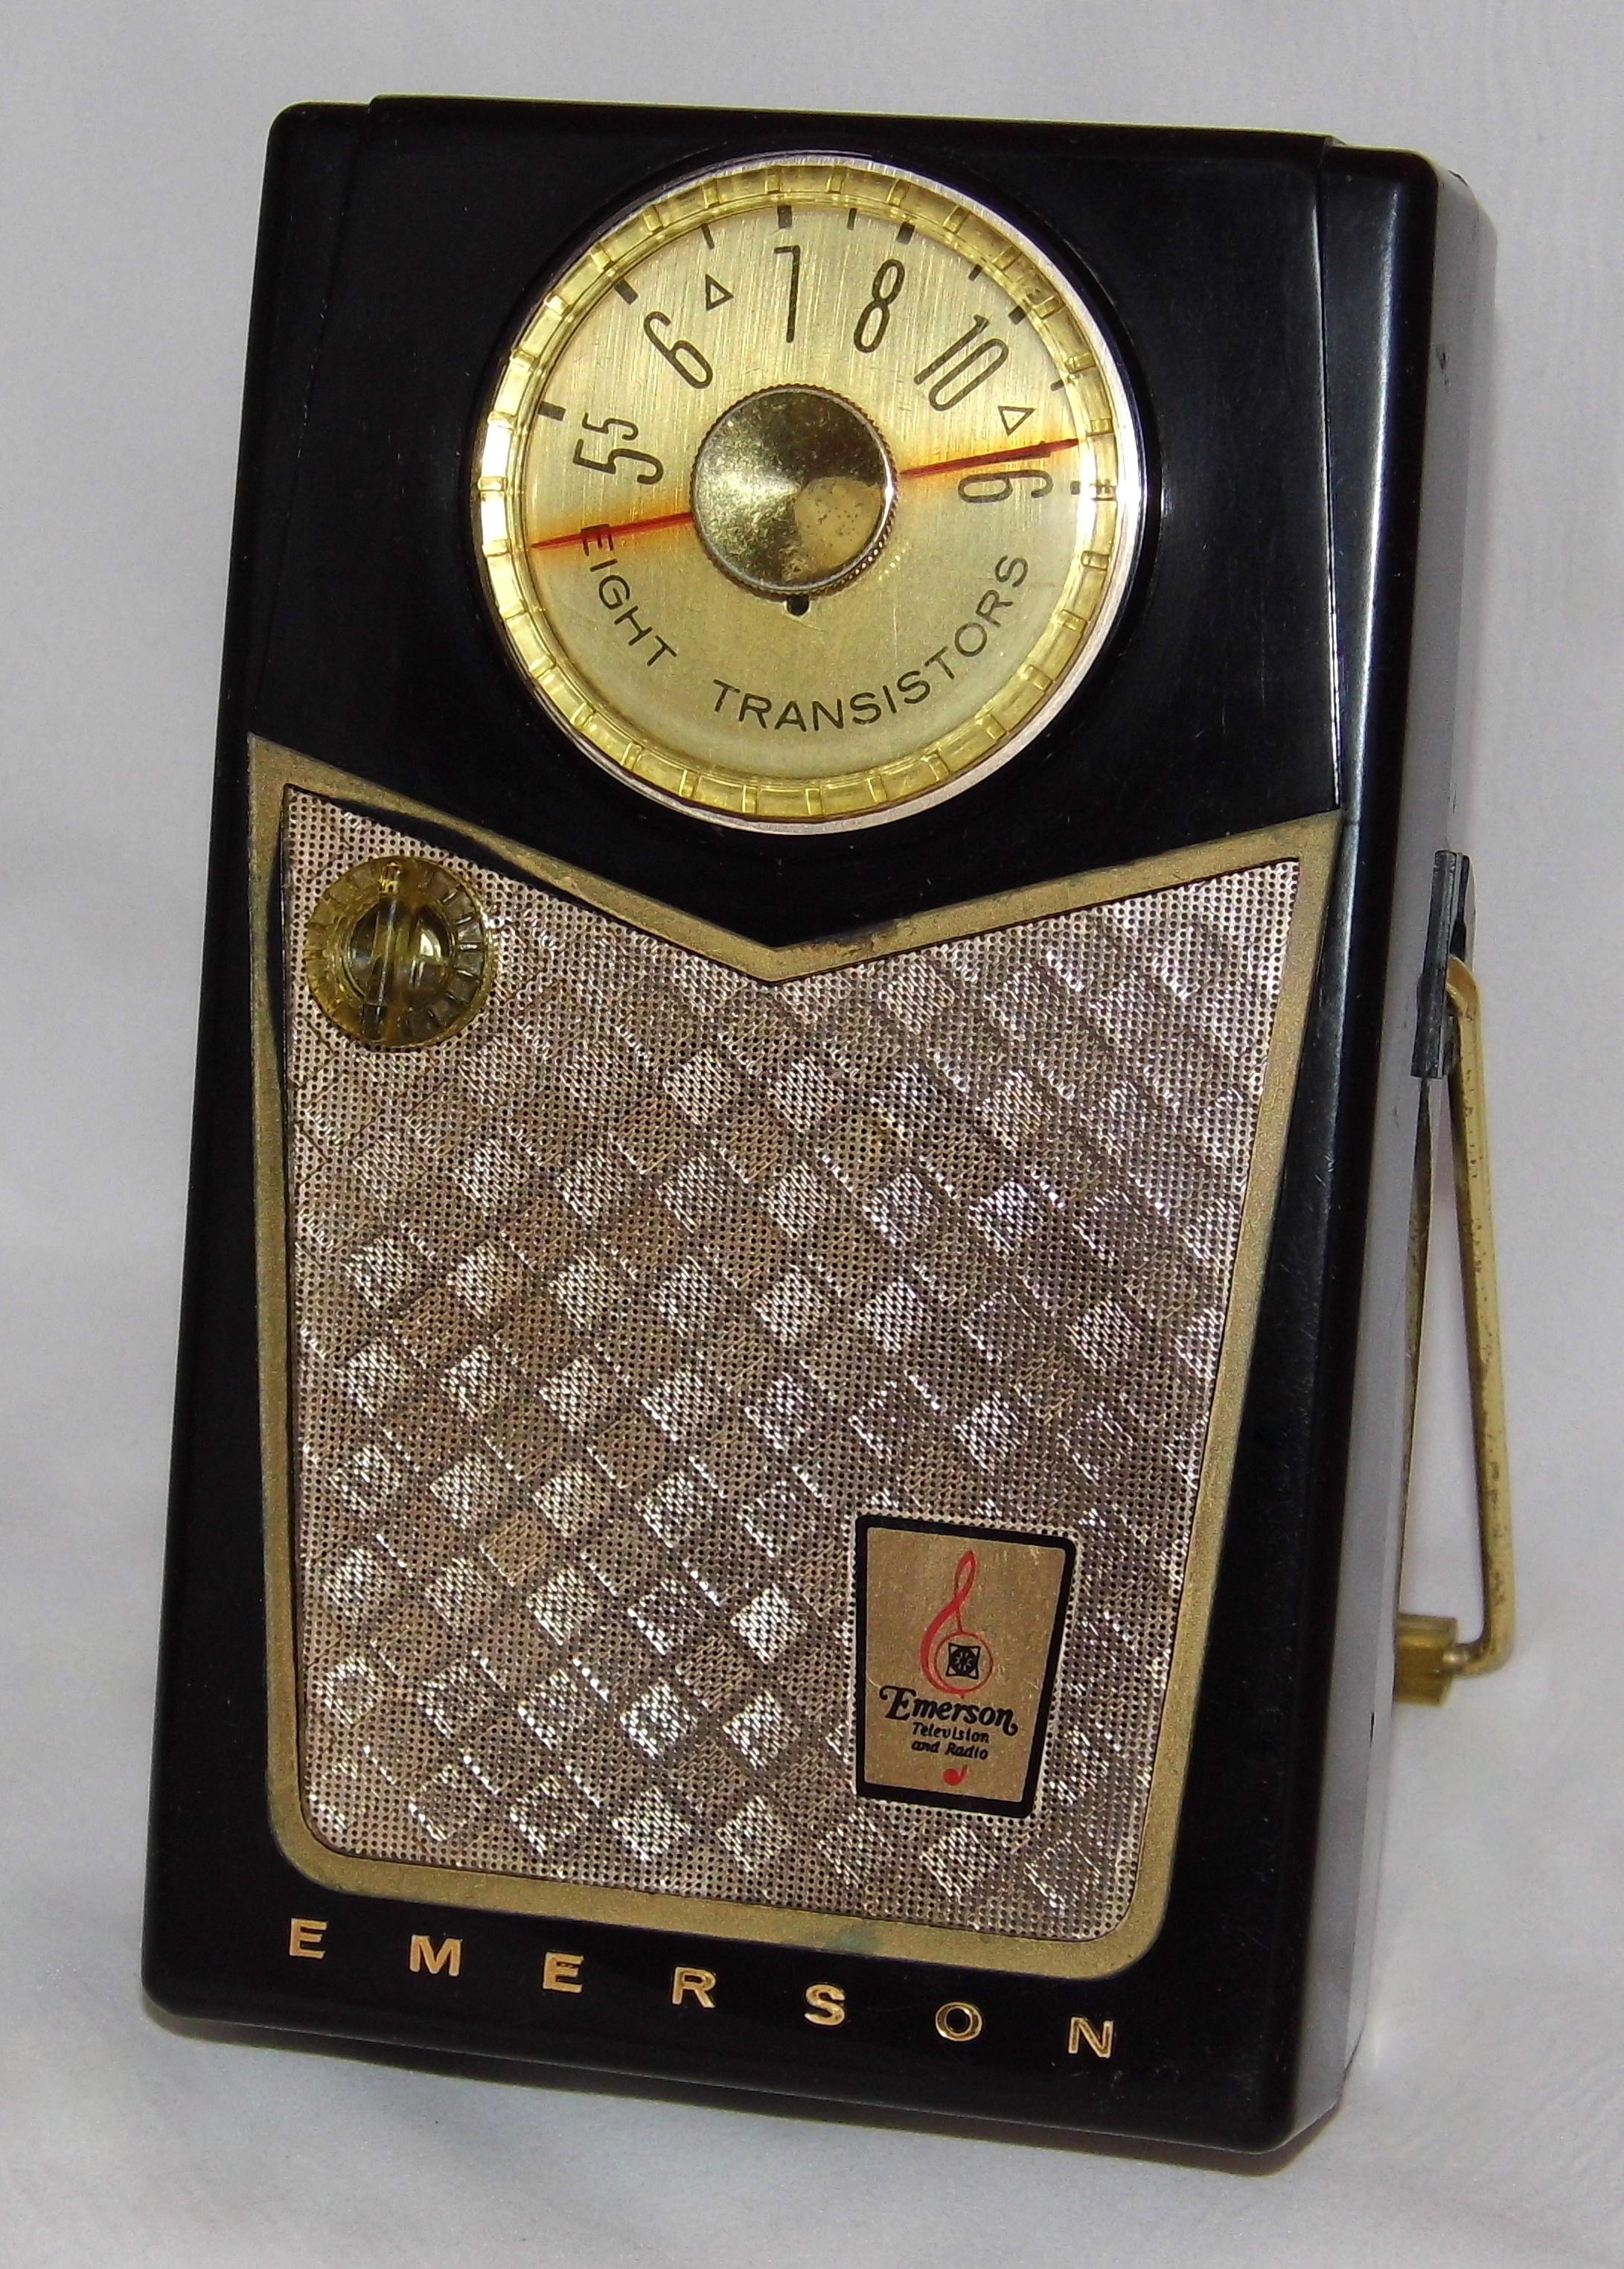 Emerson_Model_888_Pioneer_8-Transistor_AM_Radio,_Made_in_the_USA,_Circa_1958_(21973868670).jpg